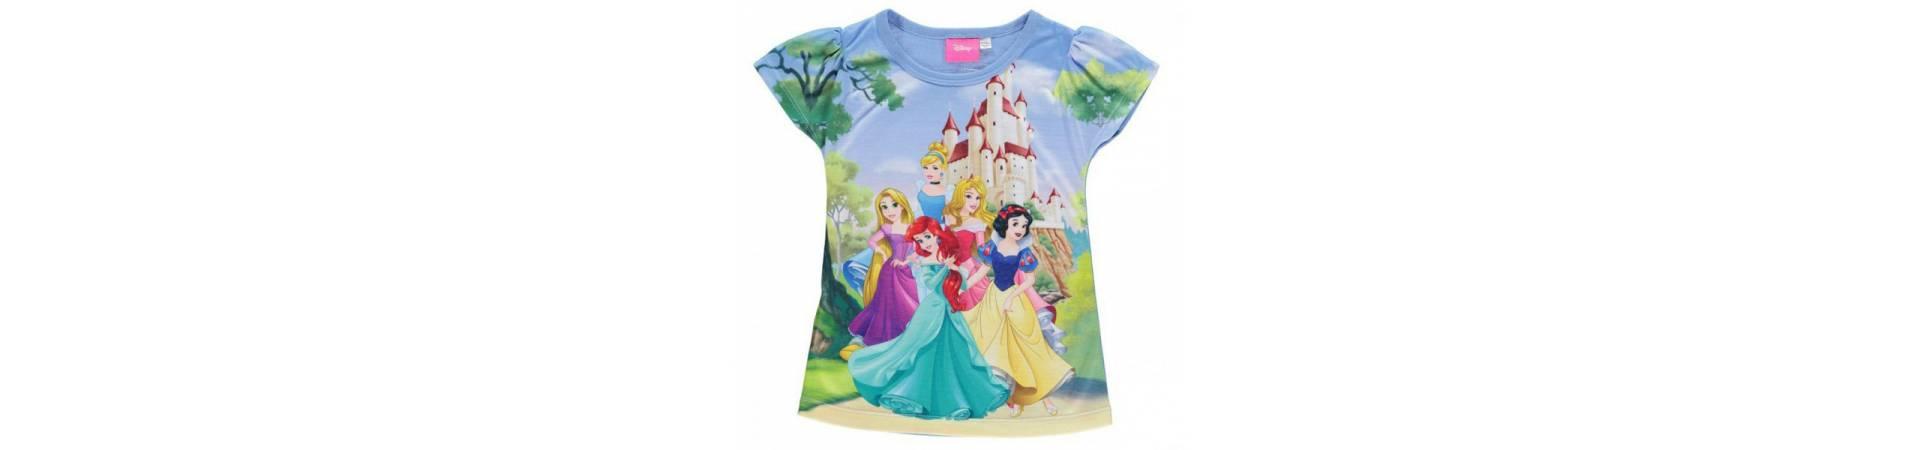 Disney hercegnő - Ruhanemű